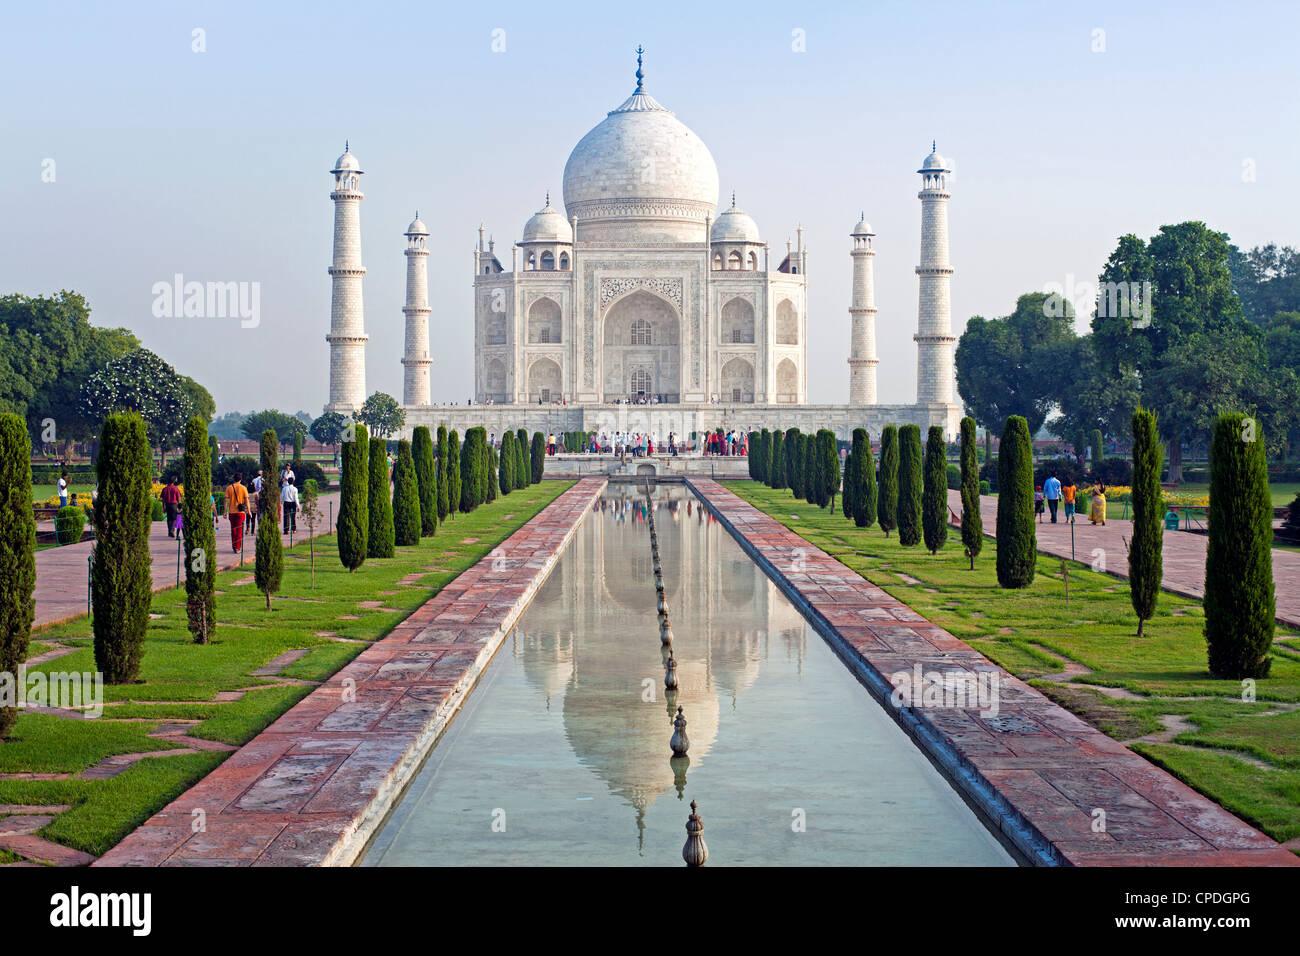 Taj Mahal, UNESCO World Heritage Site, Agra, Uttar Pradesh state, India, Asia - Stock Image